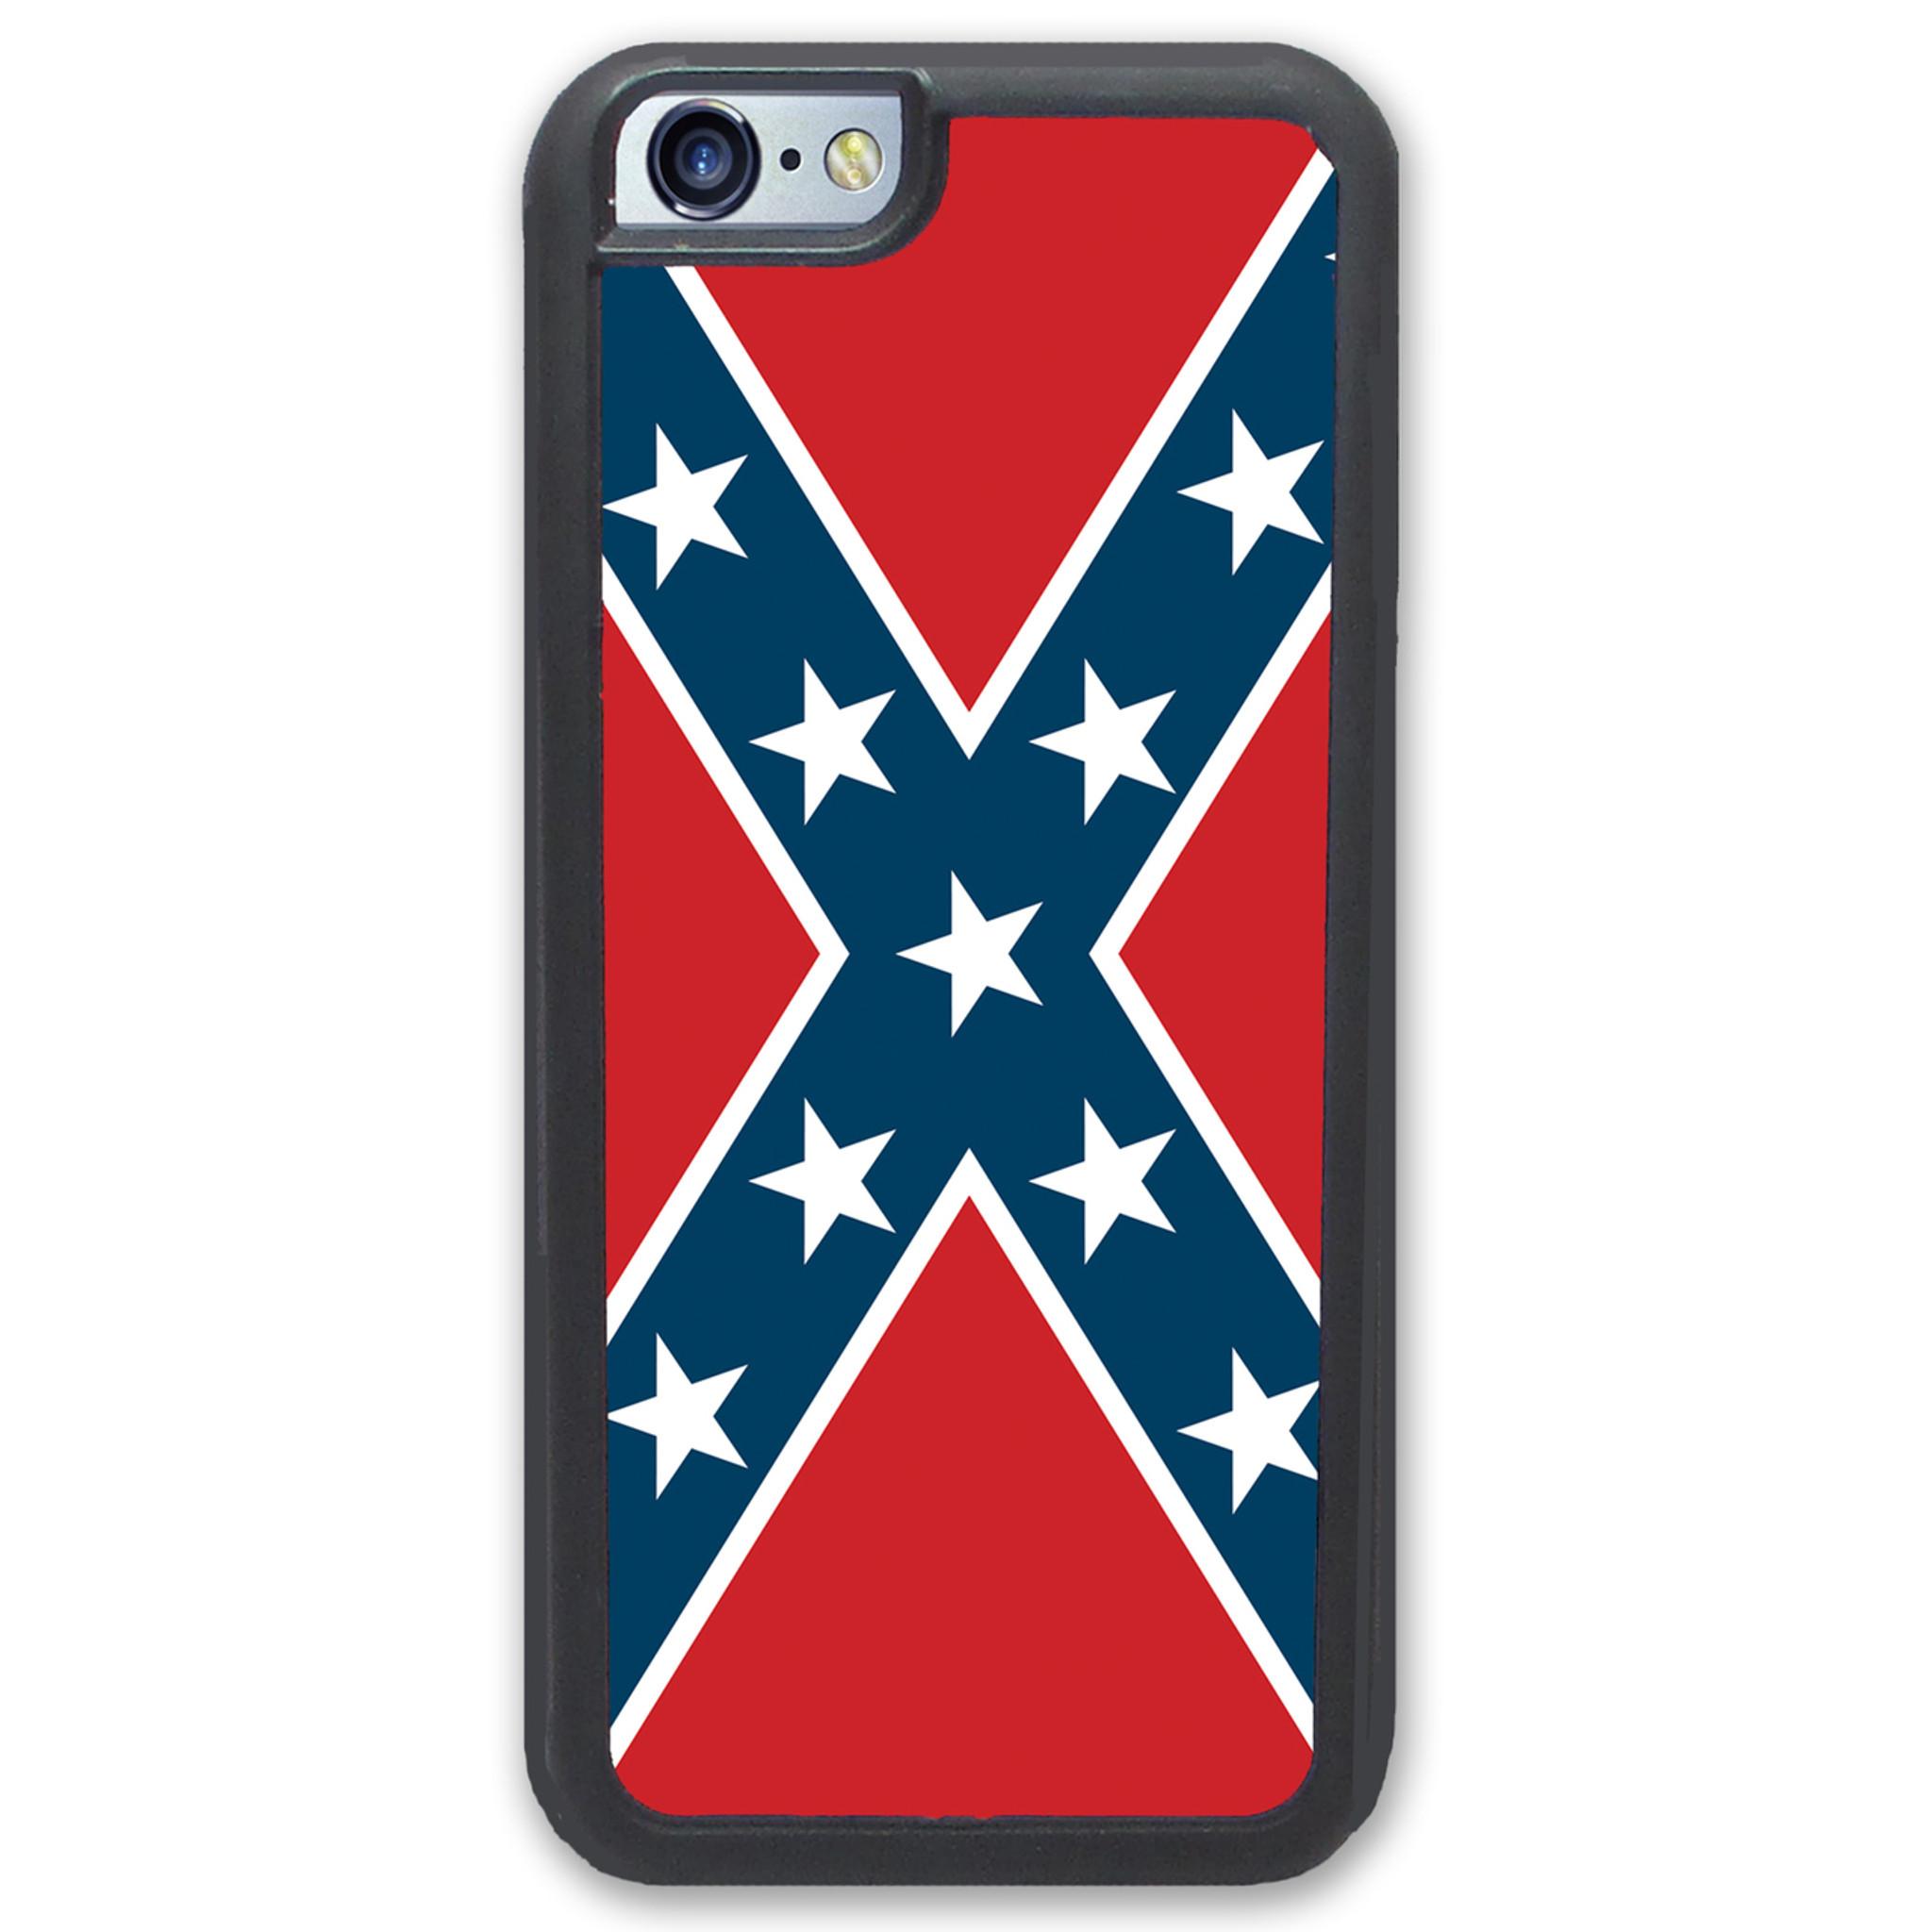 rebel flag iphone case confederate flag iphone case simplycustomized